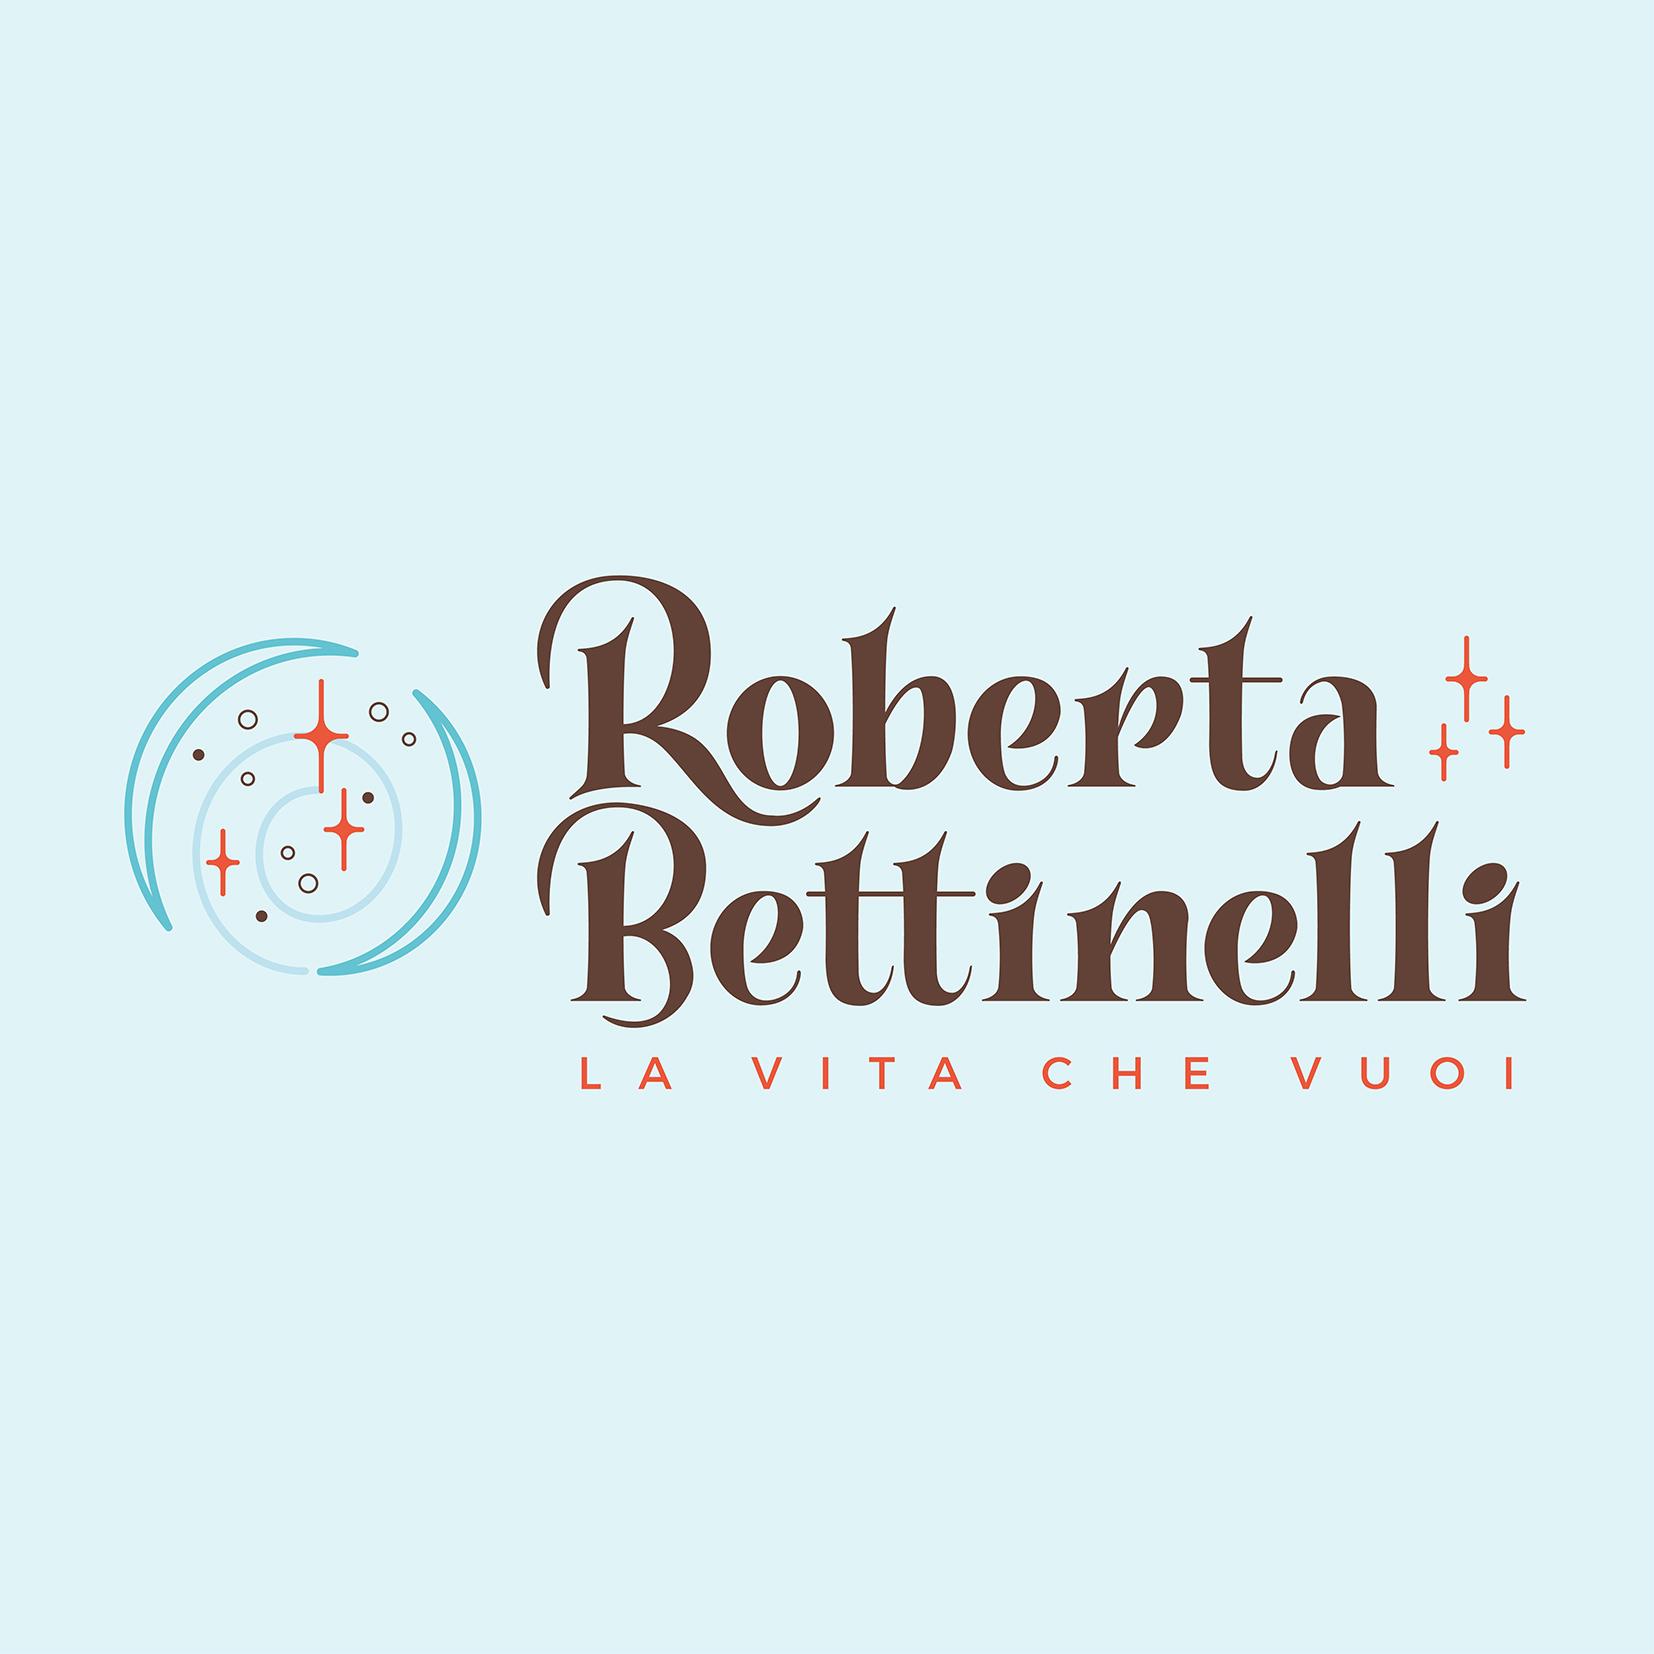 Roberta Bettinelli